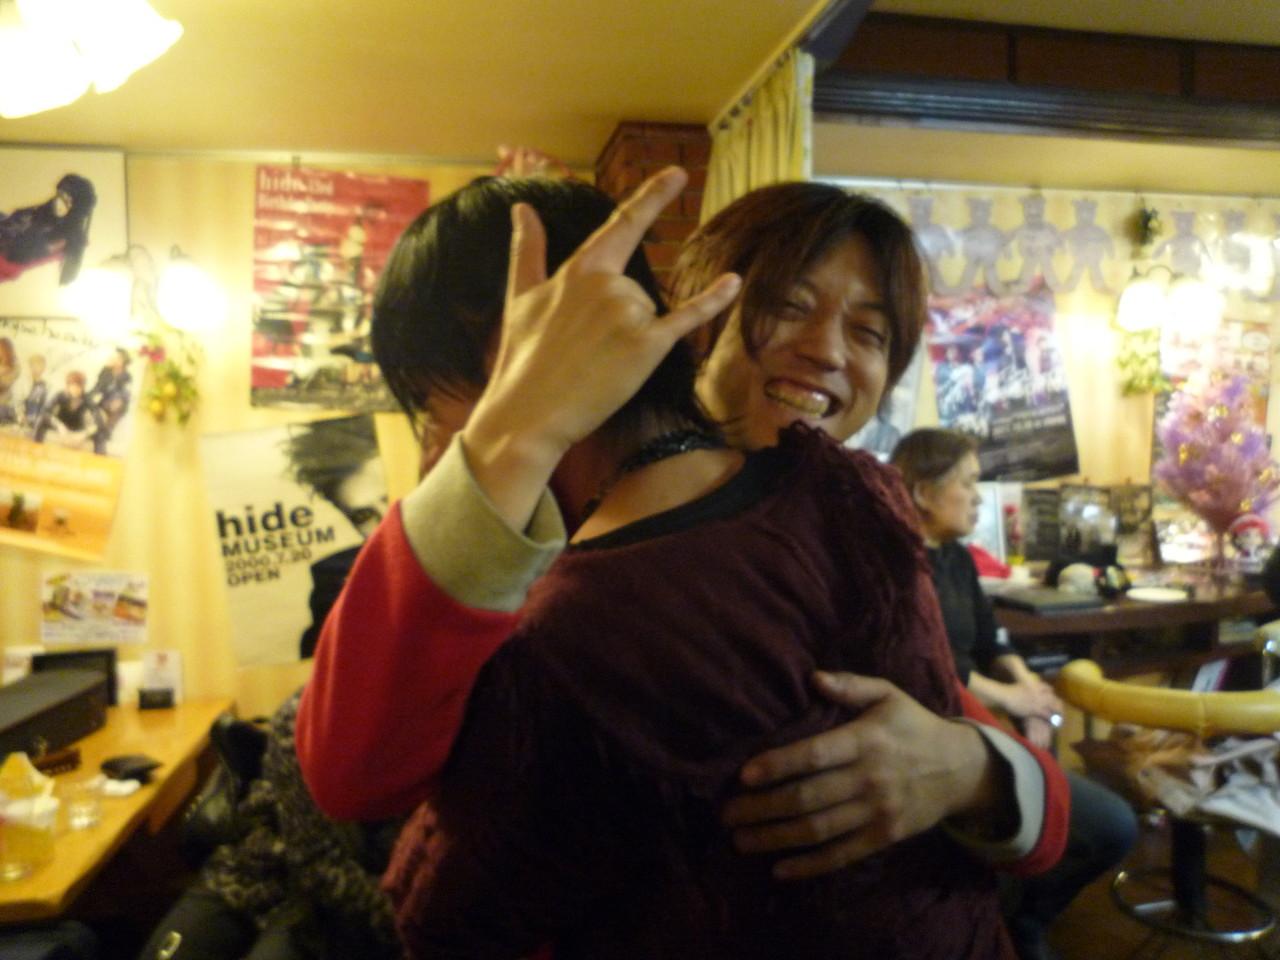 Live終了後、CUTTさんと感動のHUG!